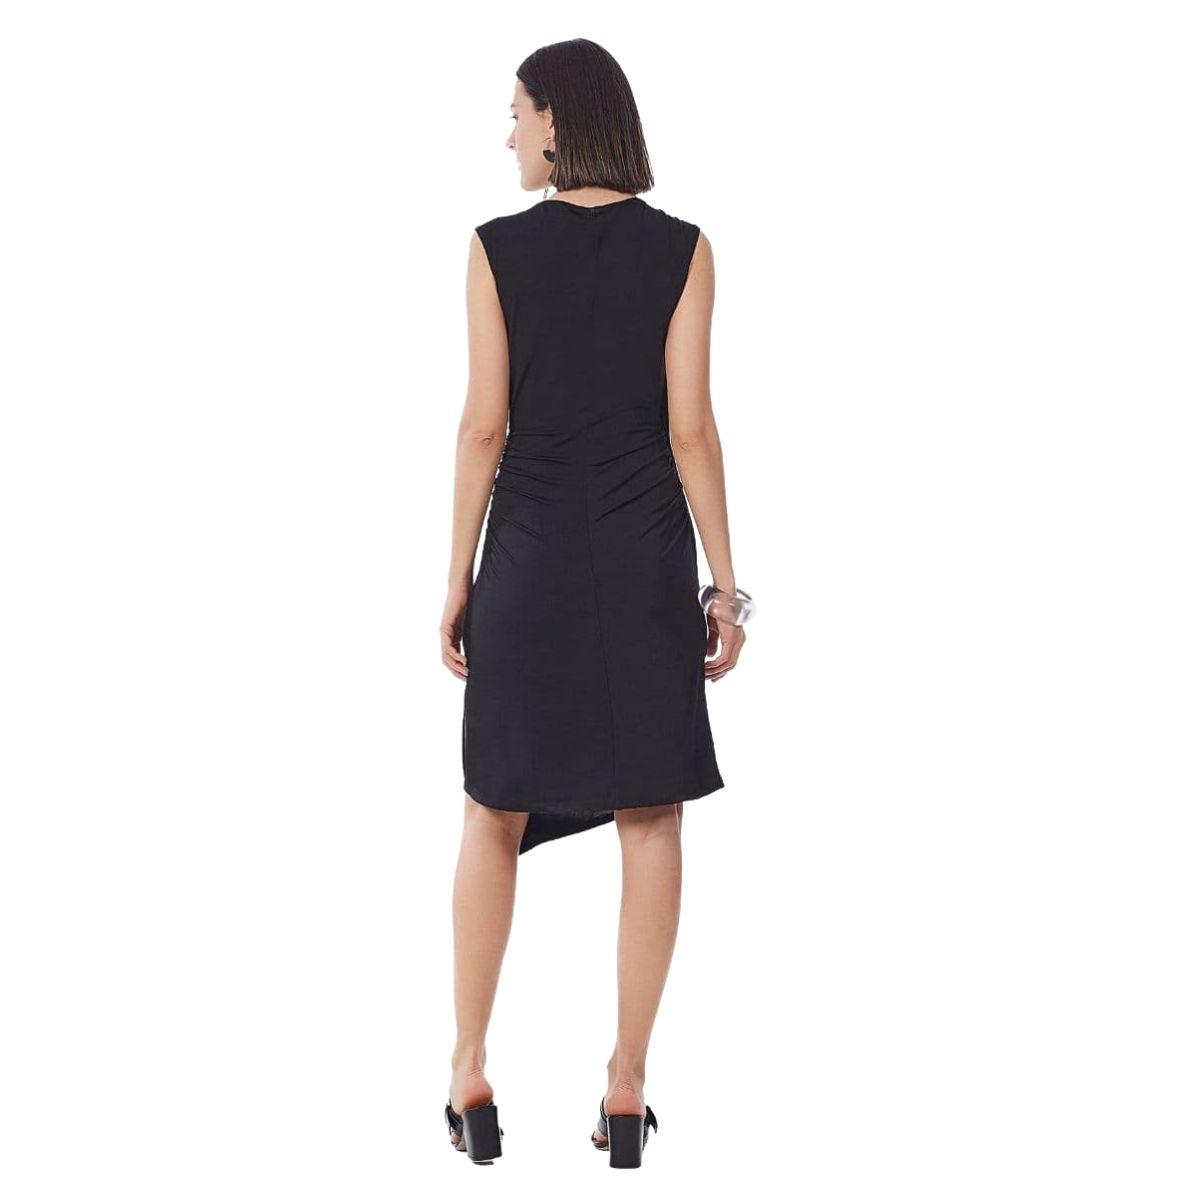 Vestido Maria Valentina Midi Decote Transpassado Com Recorte